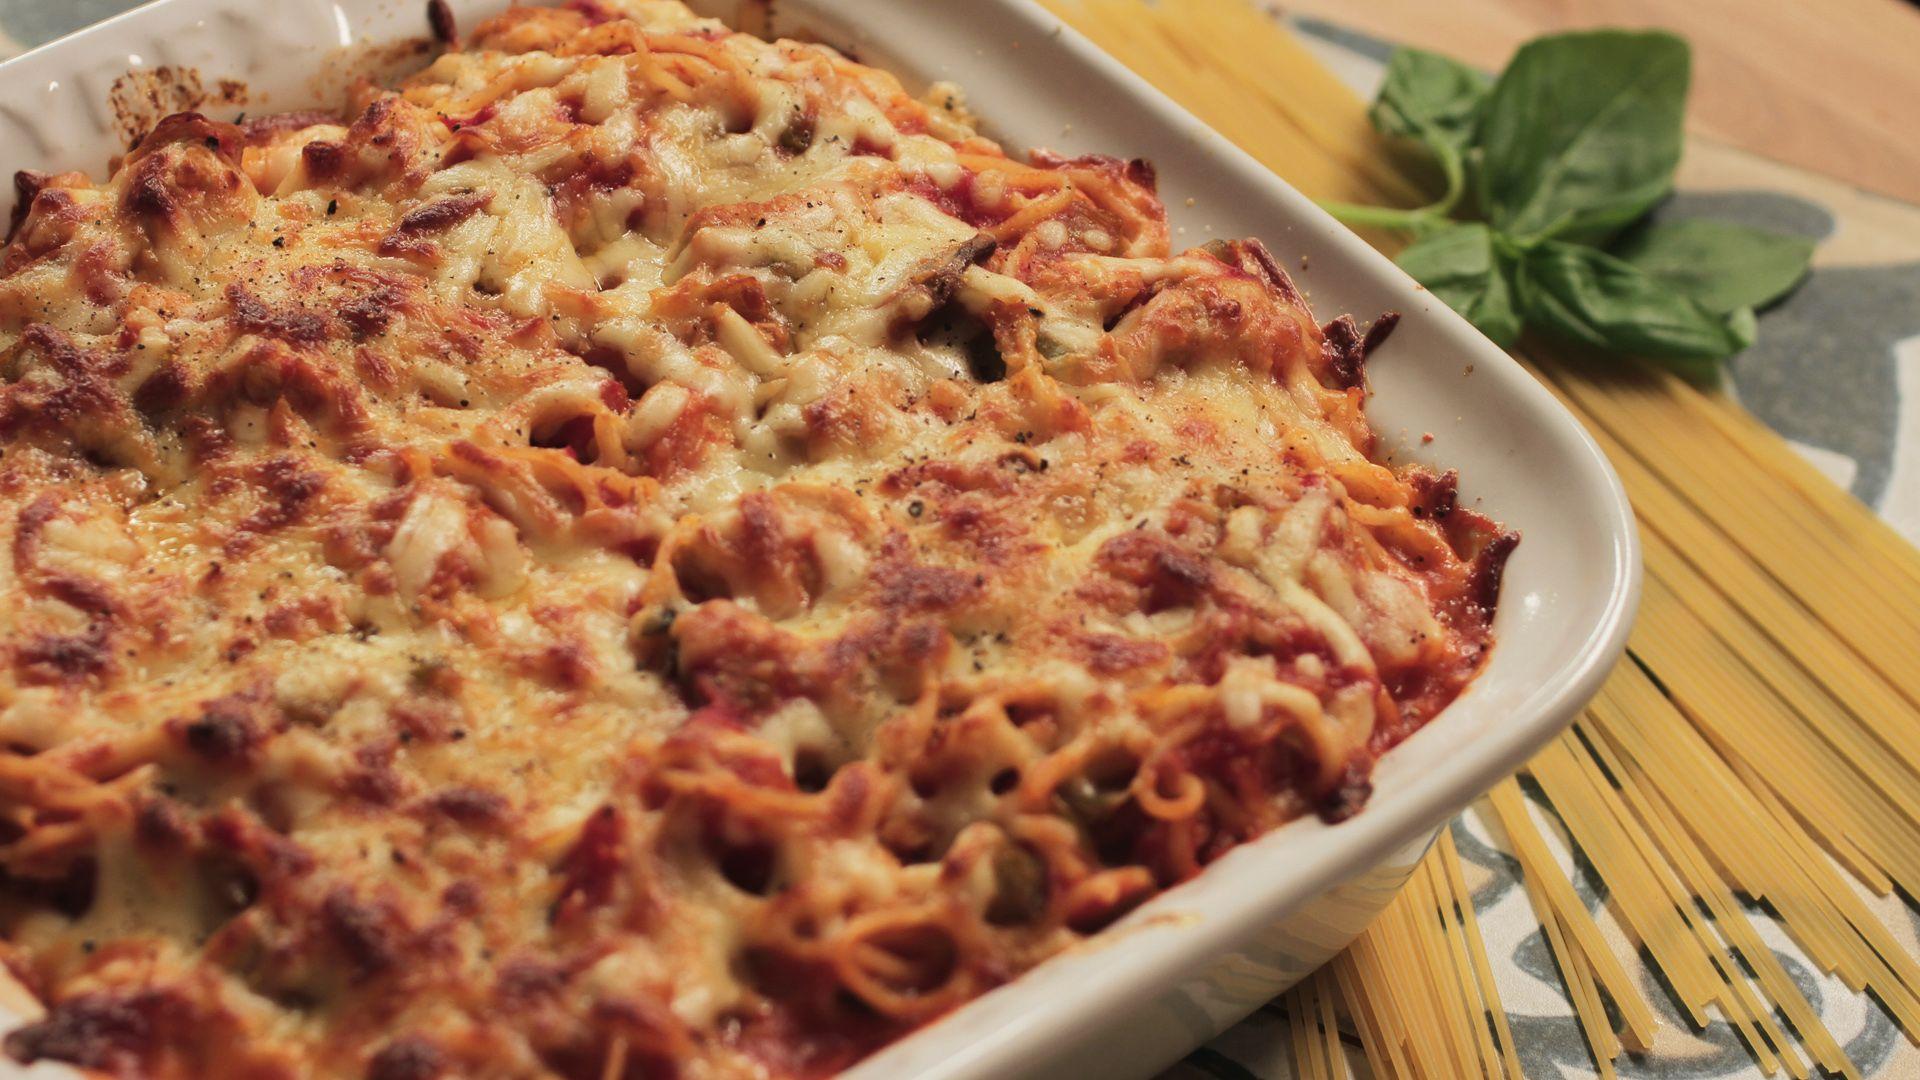 Spaghetti turkey bake. A great alternative way to enjoy turkey.http://bit.ly/1v1nZ2A